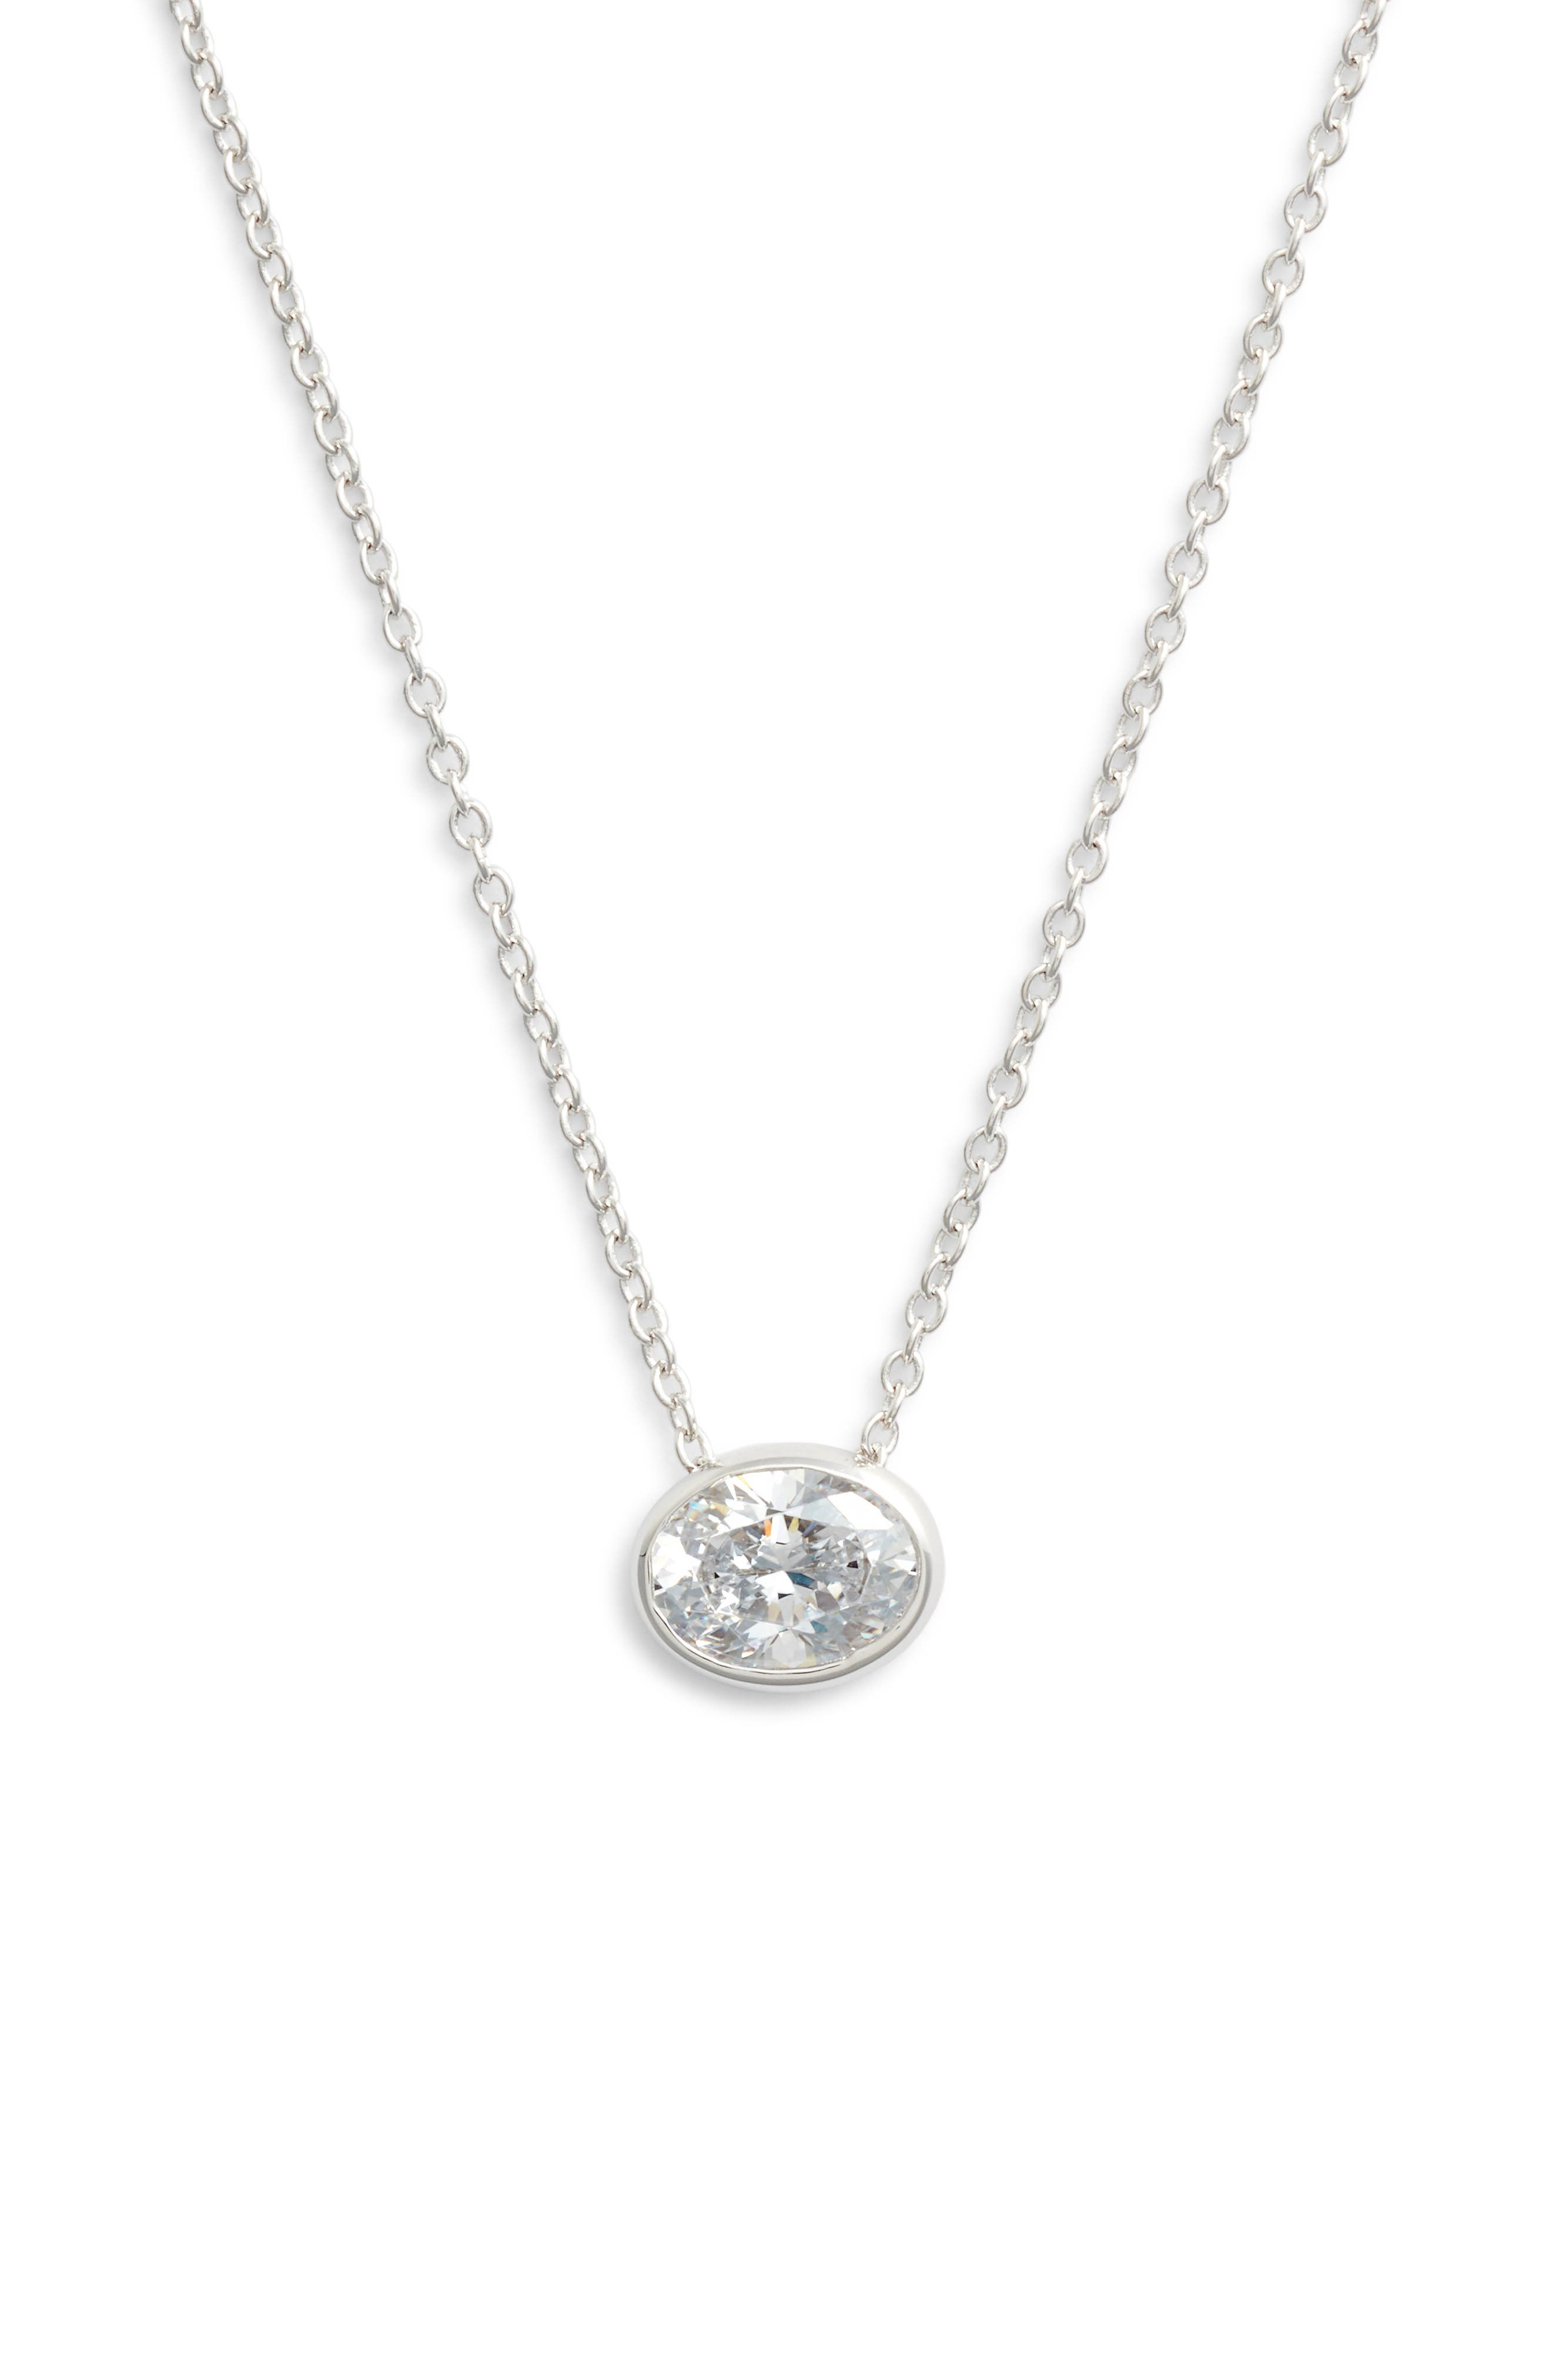 Bezel-Set Cushion-Cut Choker Necklace,                         Main,                         color, SILVER/ CLEAR